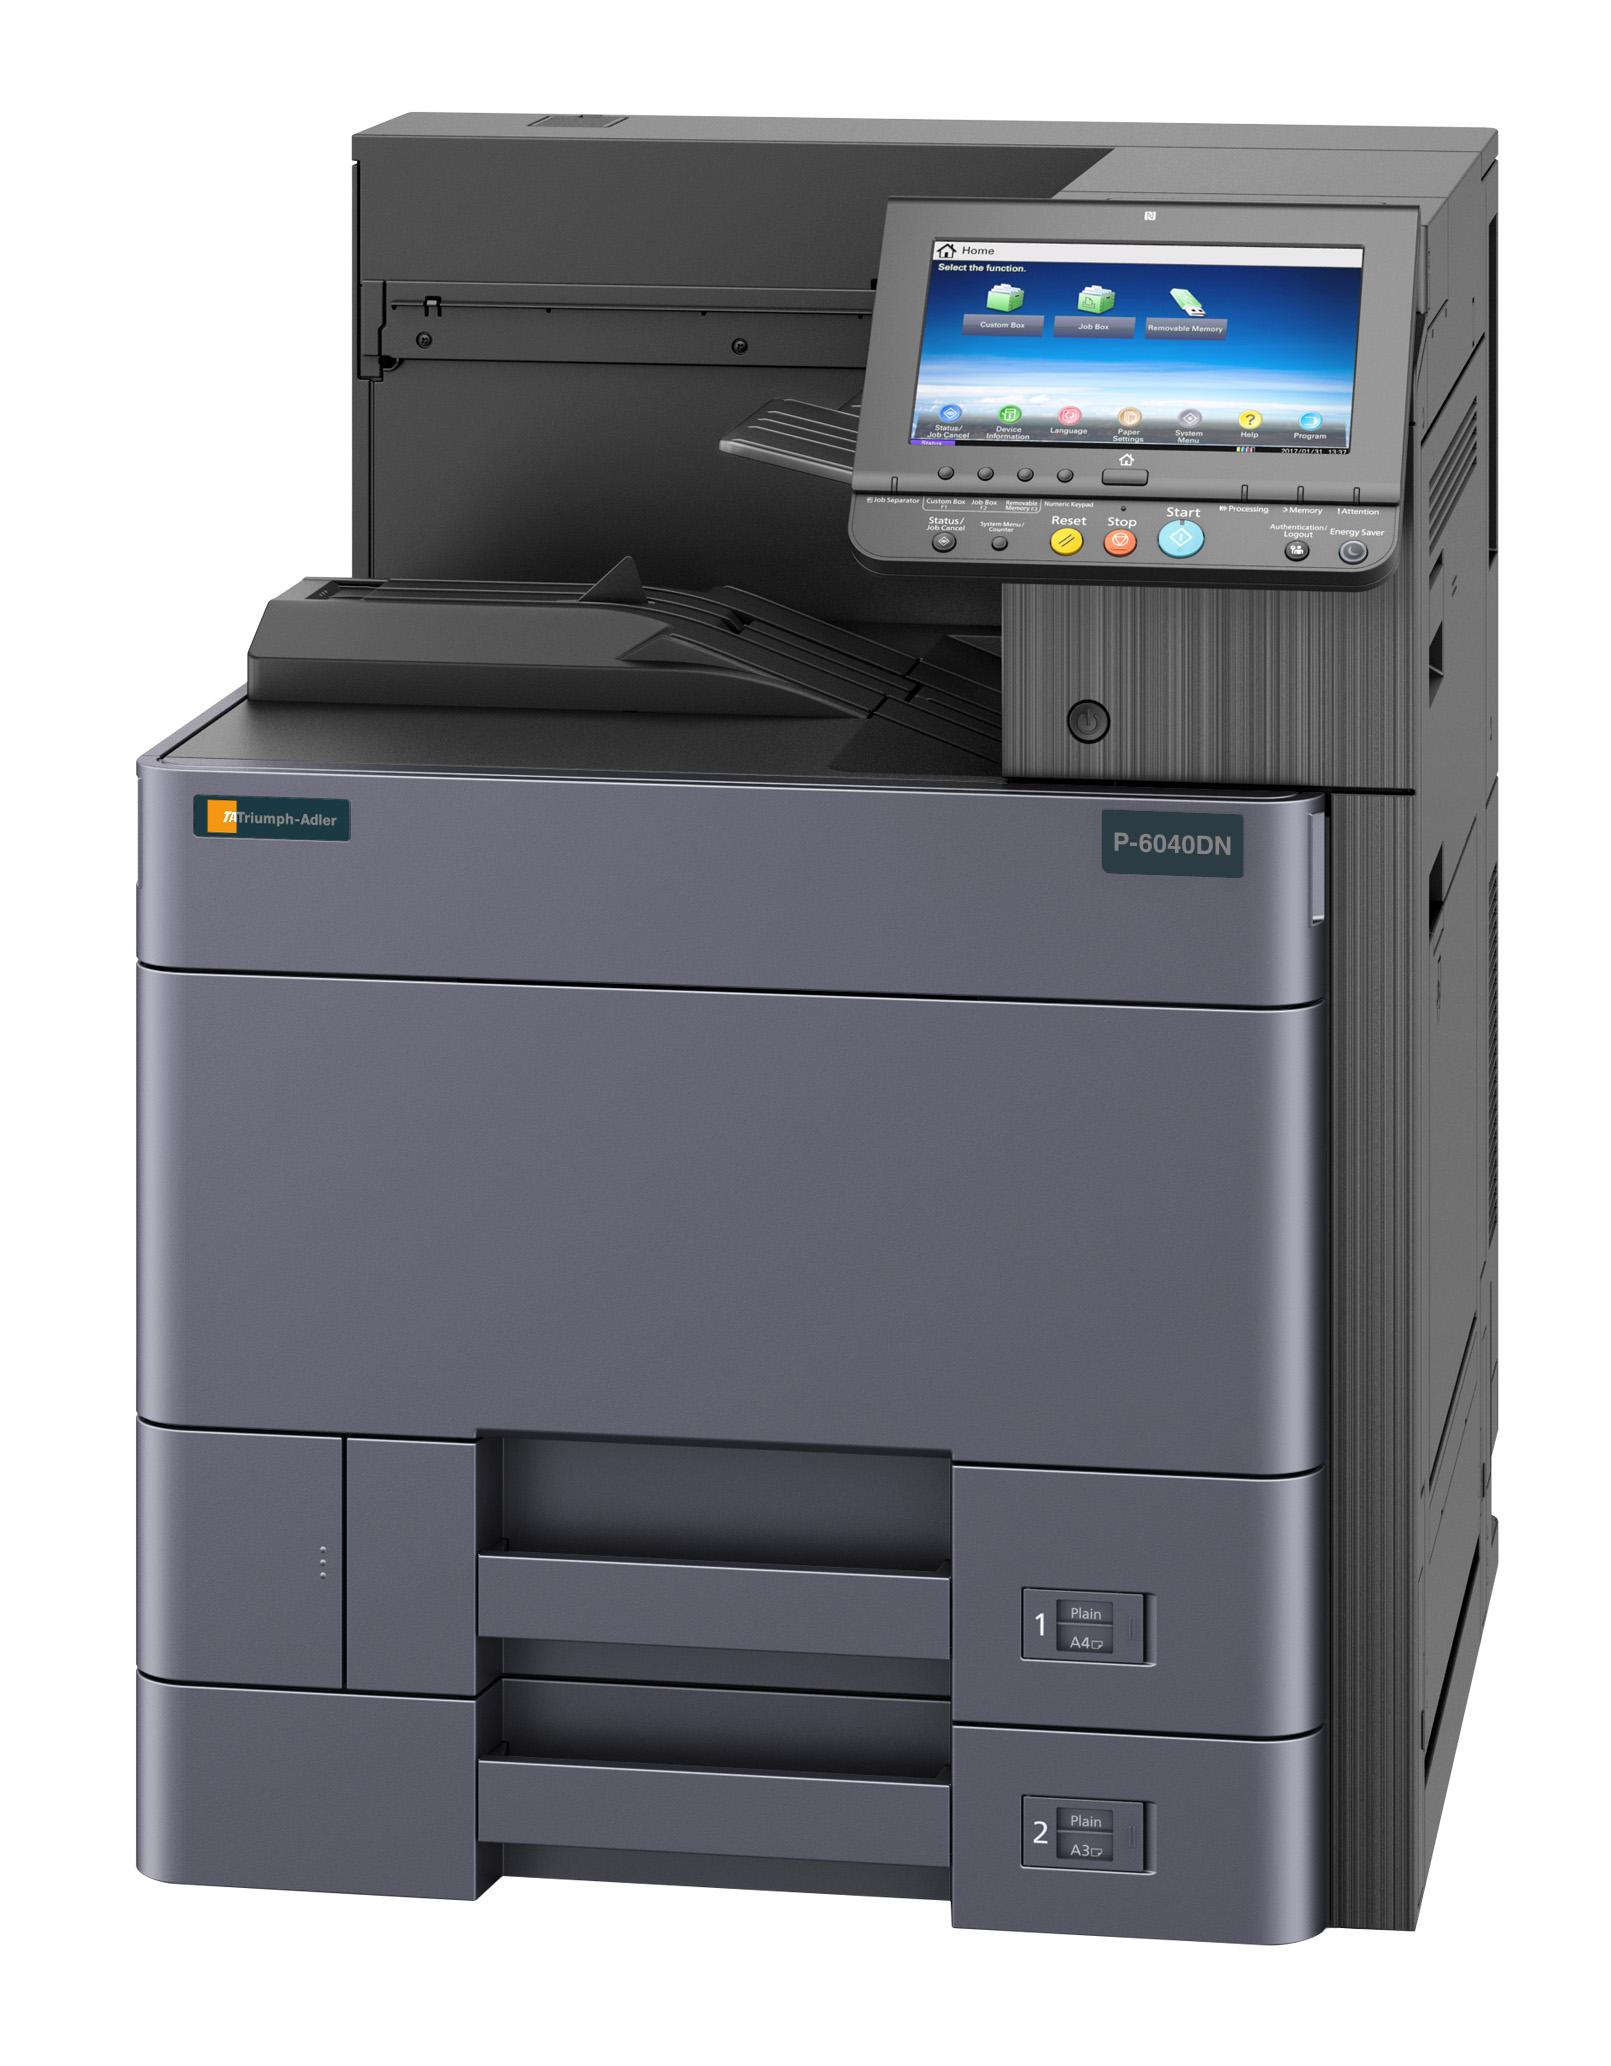 Triumph Adler stampante P-6040 DN